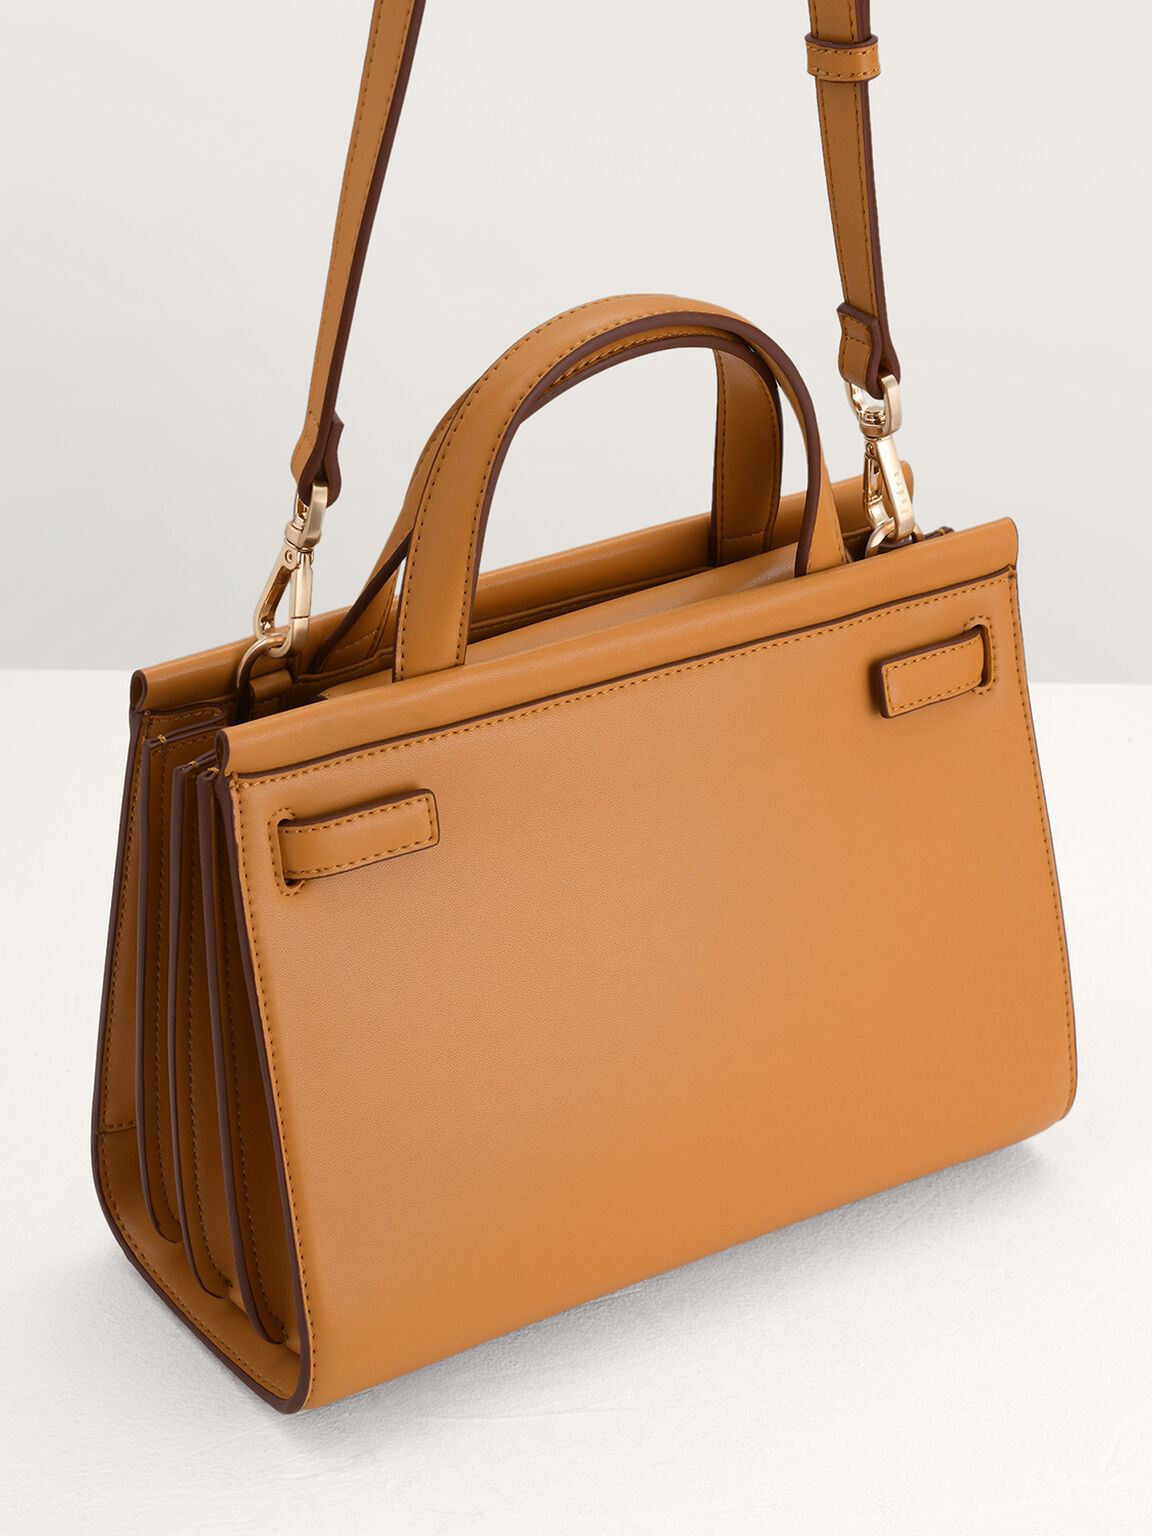 Structured Top Handle Bag, Camel, hi-res